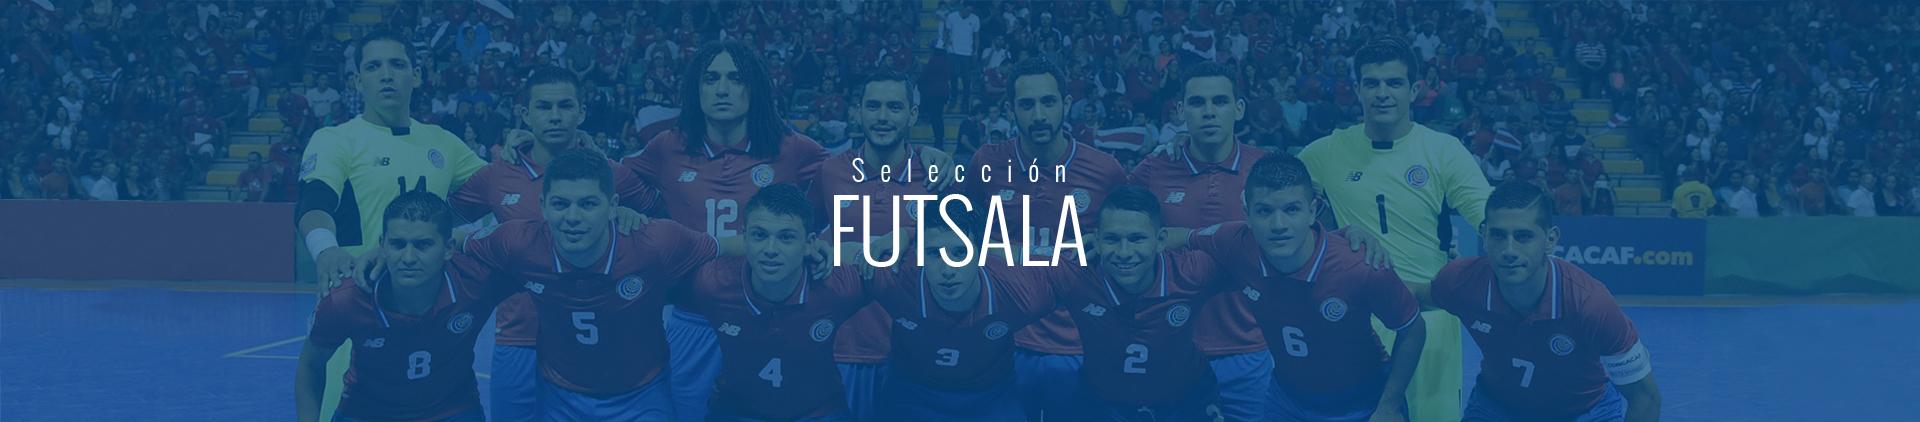 futsalaseleccionesMasculinas_hover